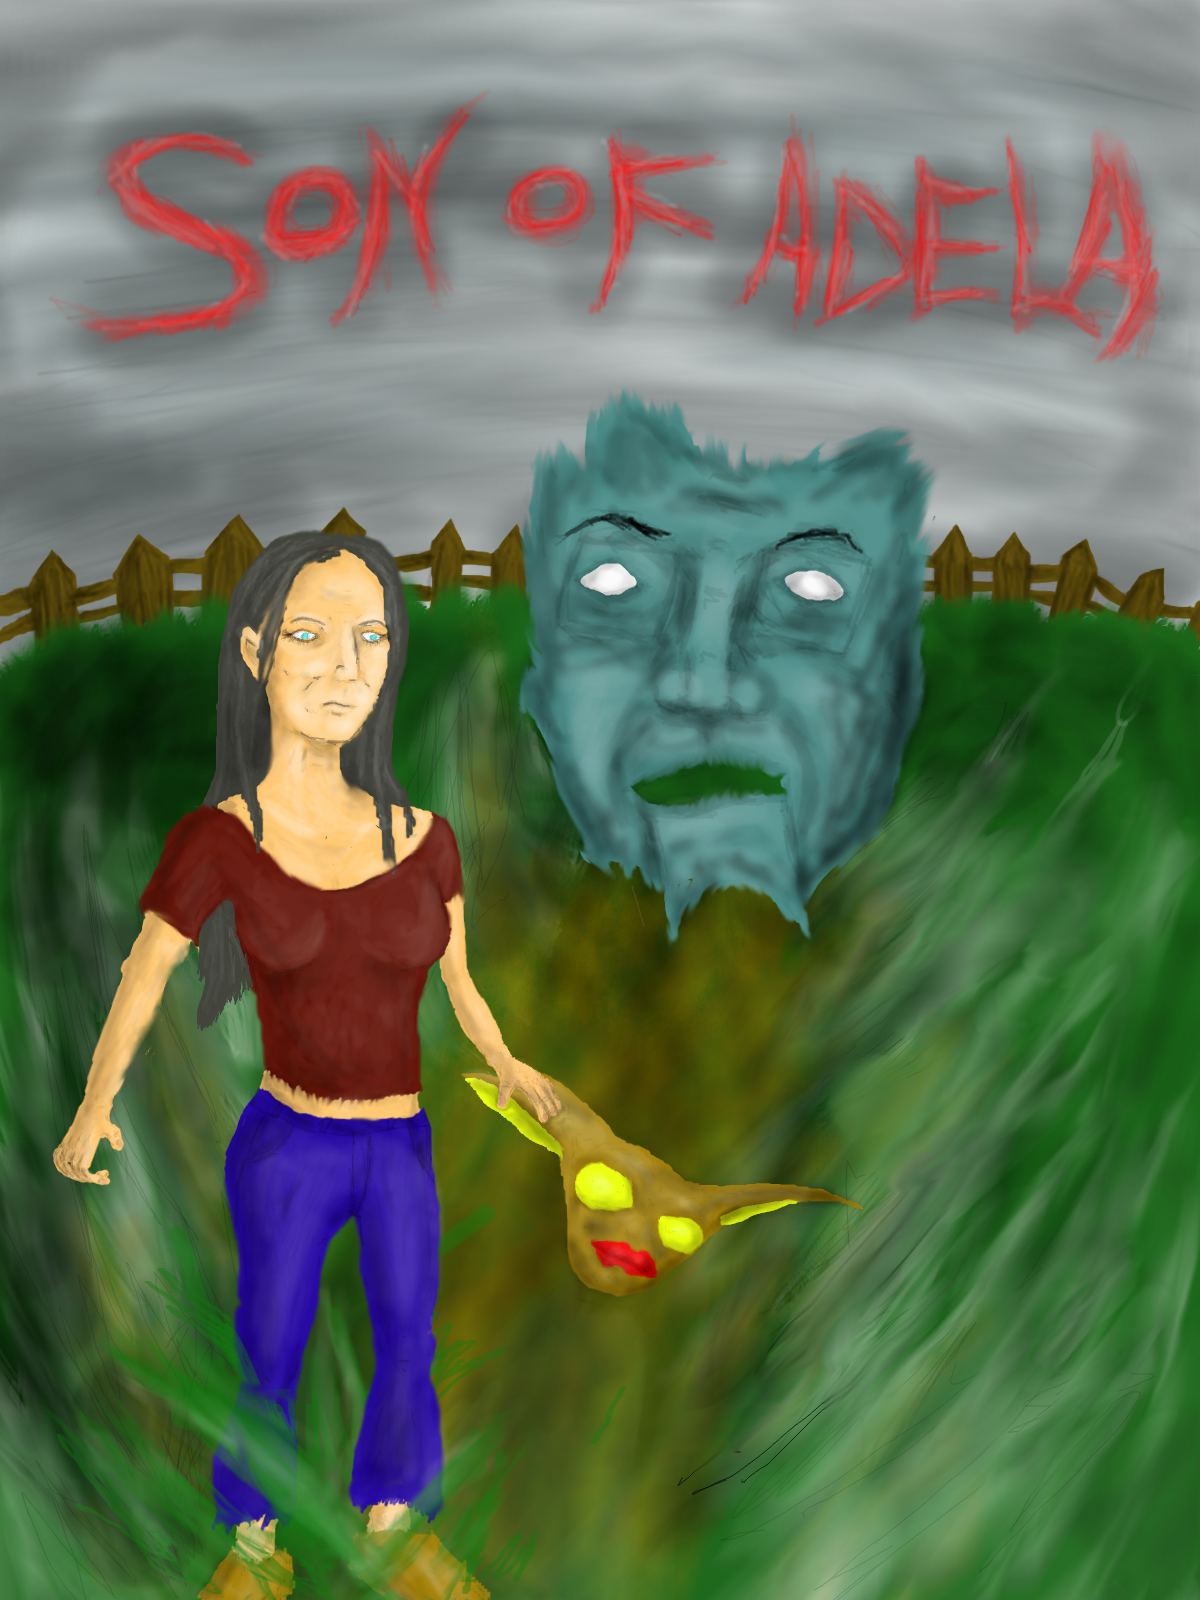 Son of Adela Illustration 1